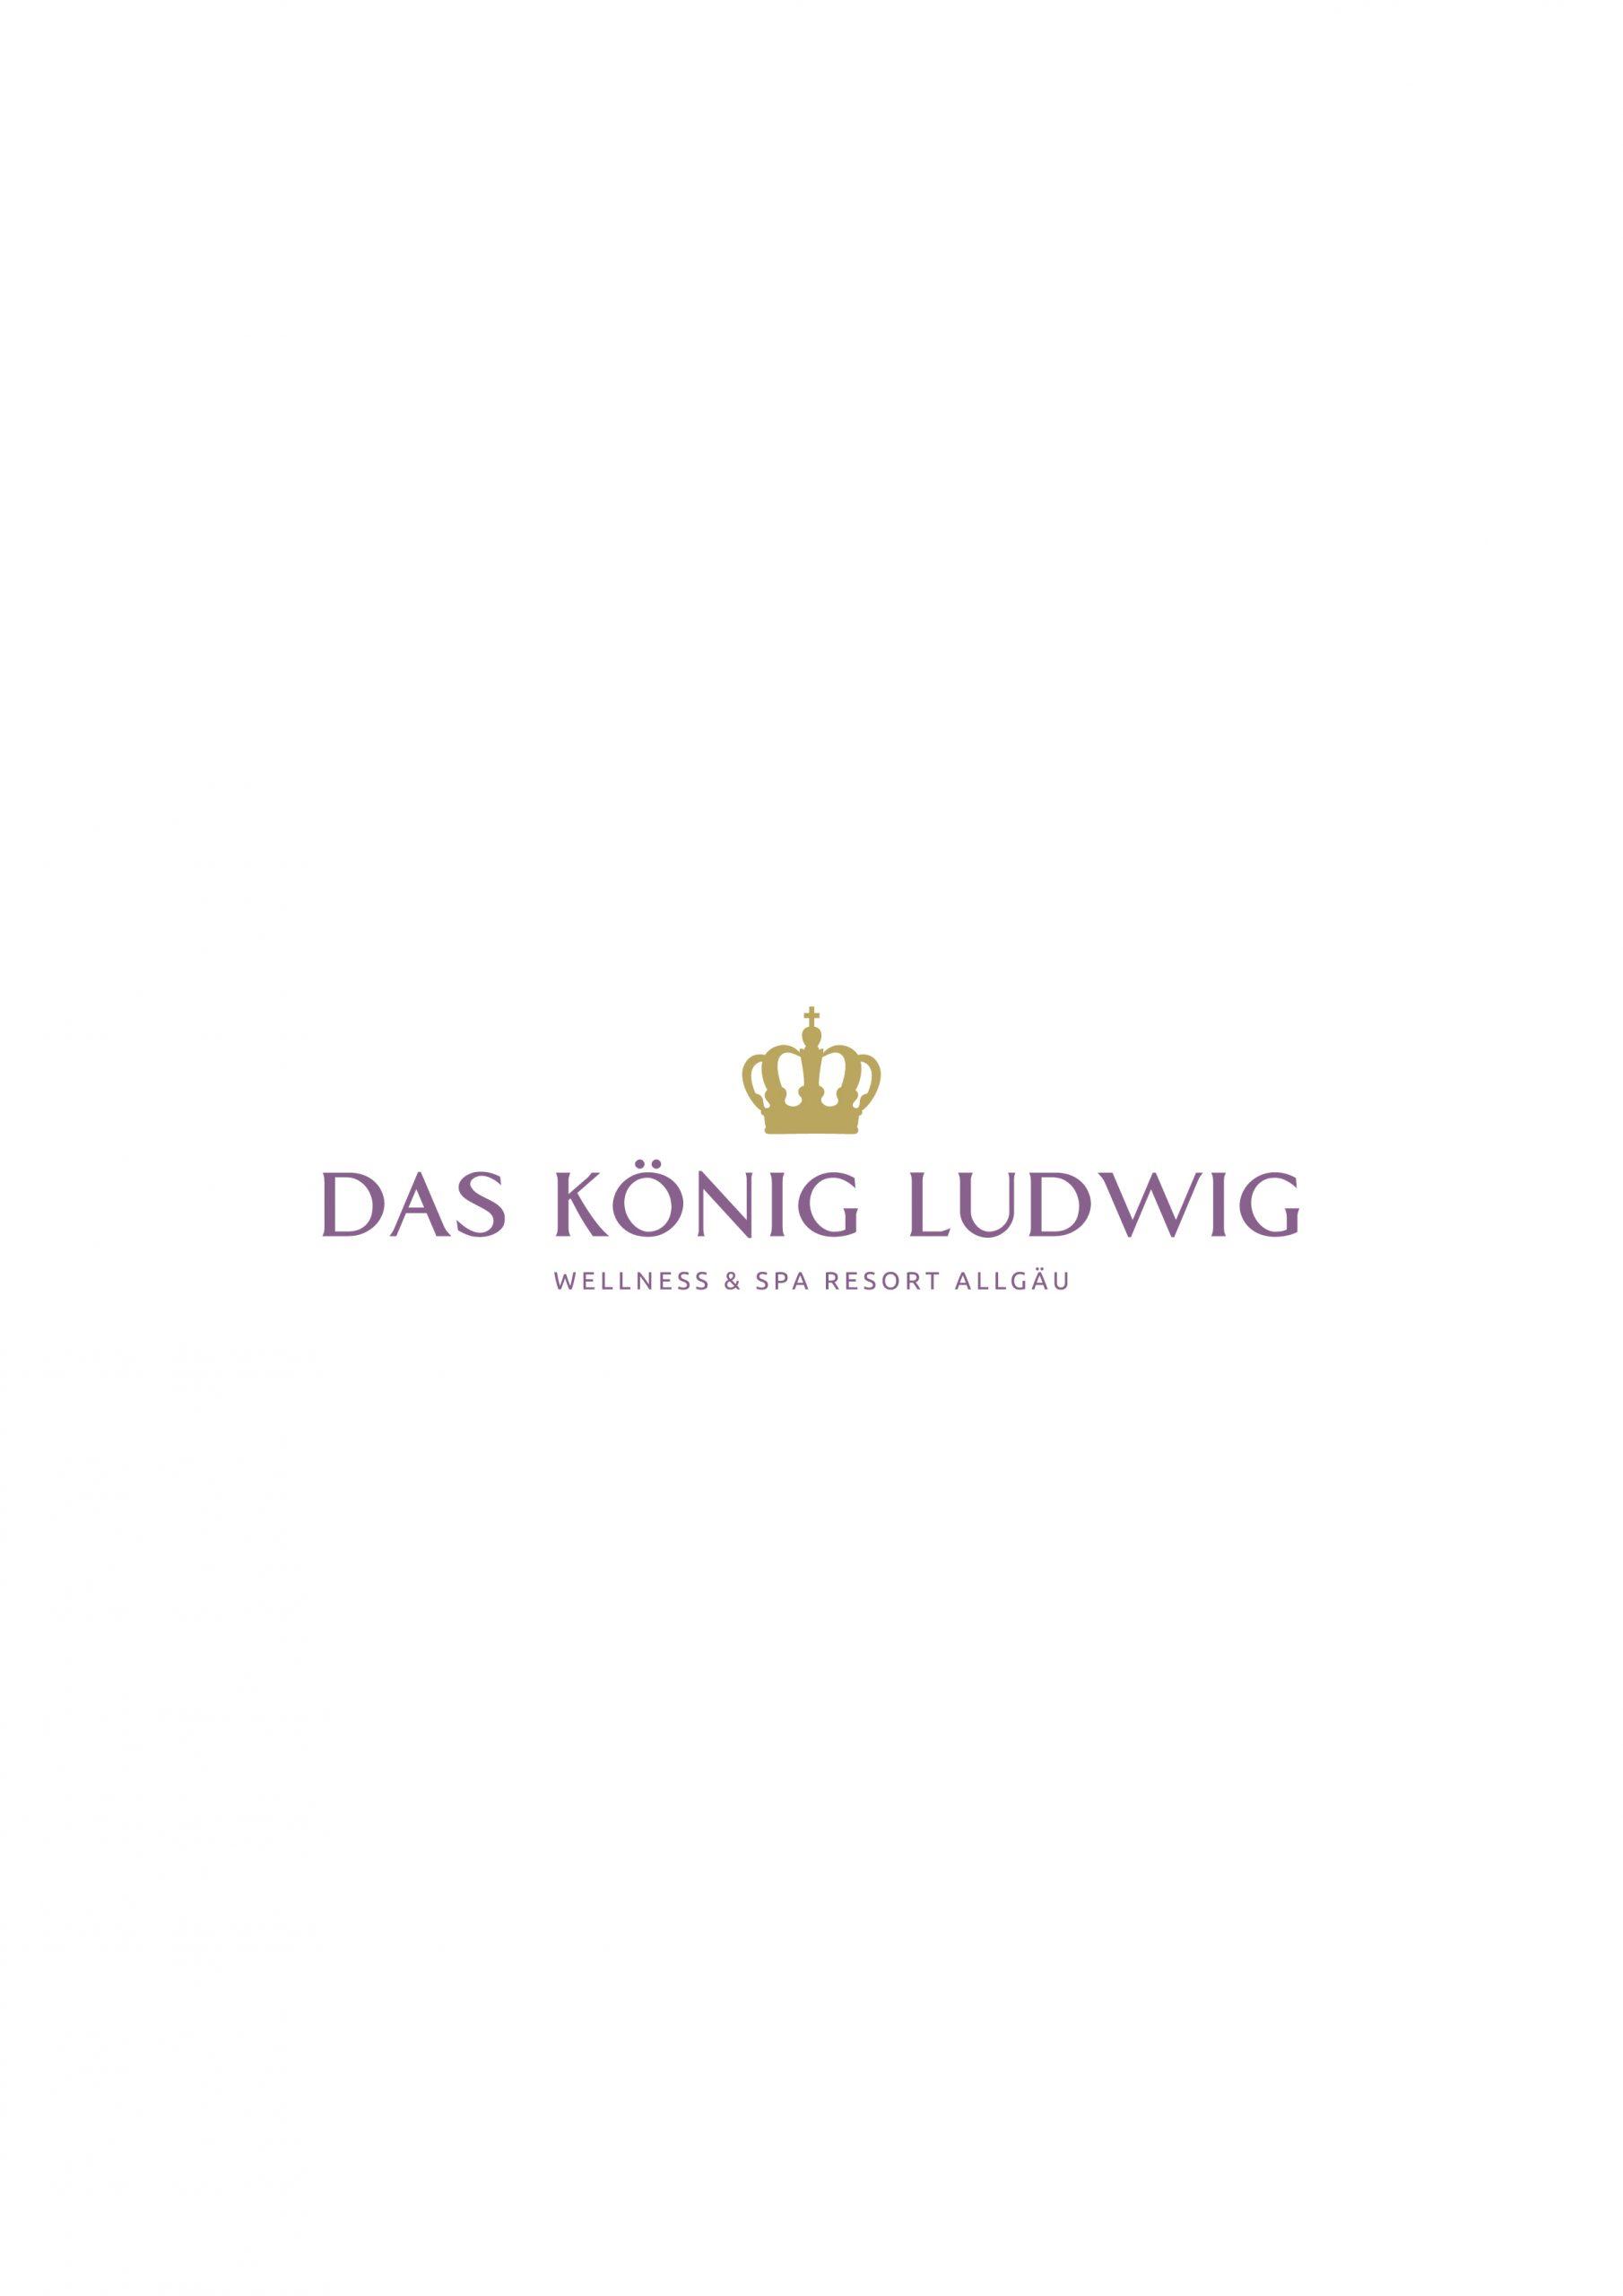 logo könig ludwig